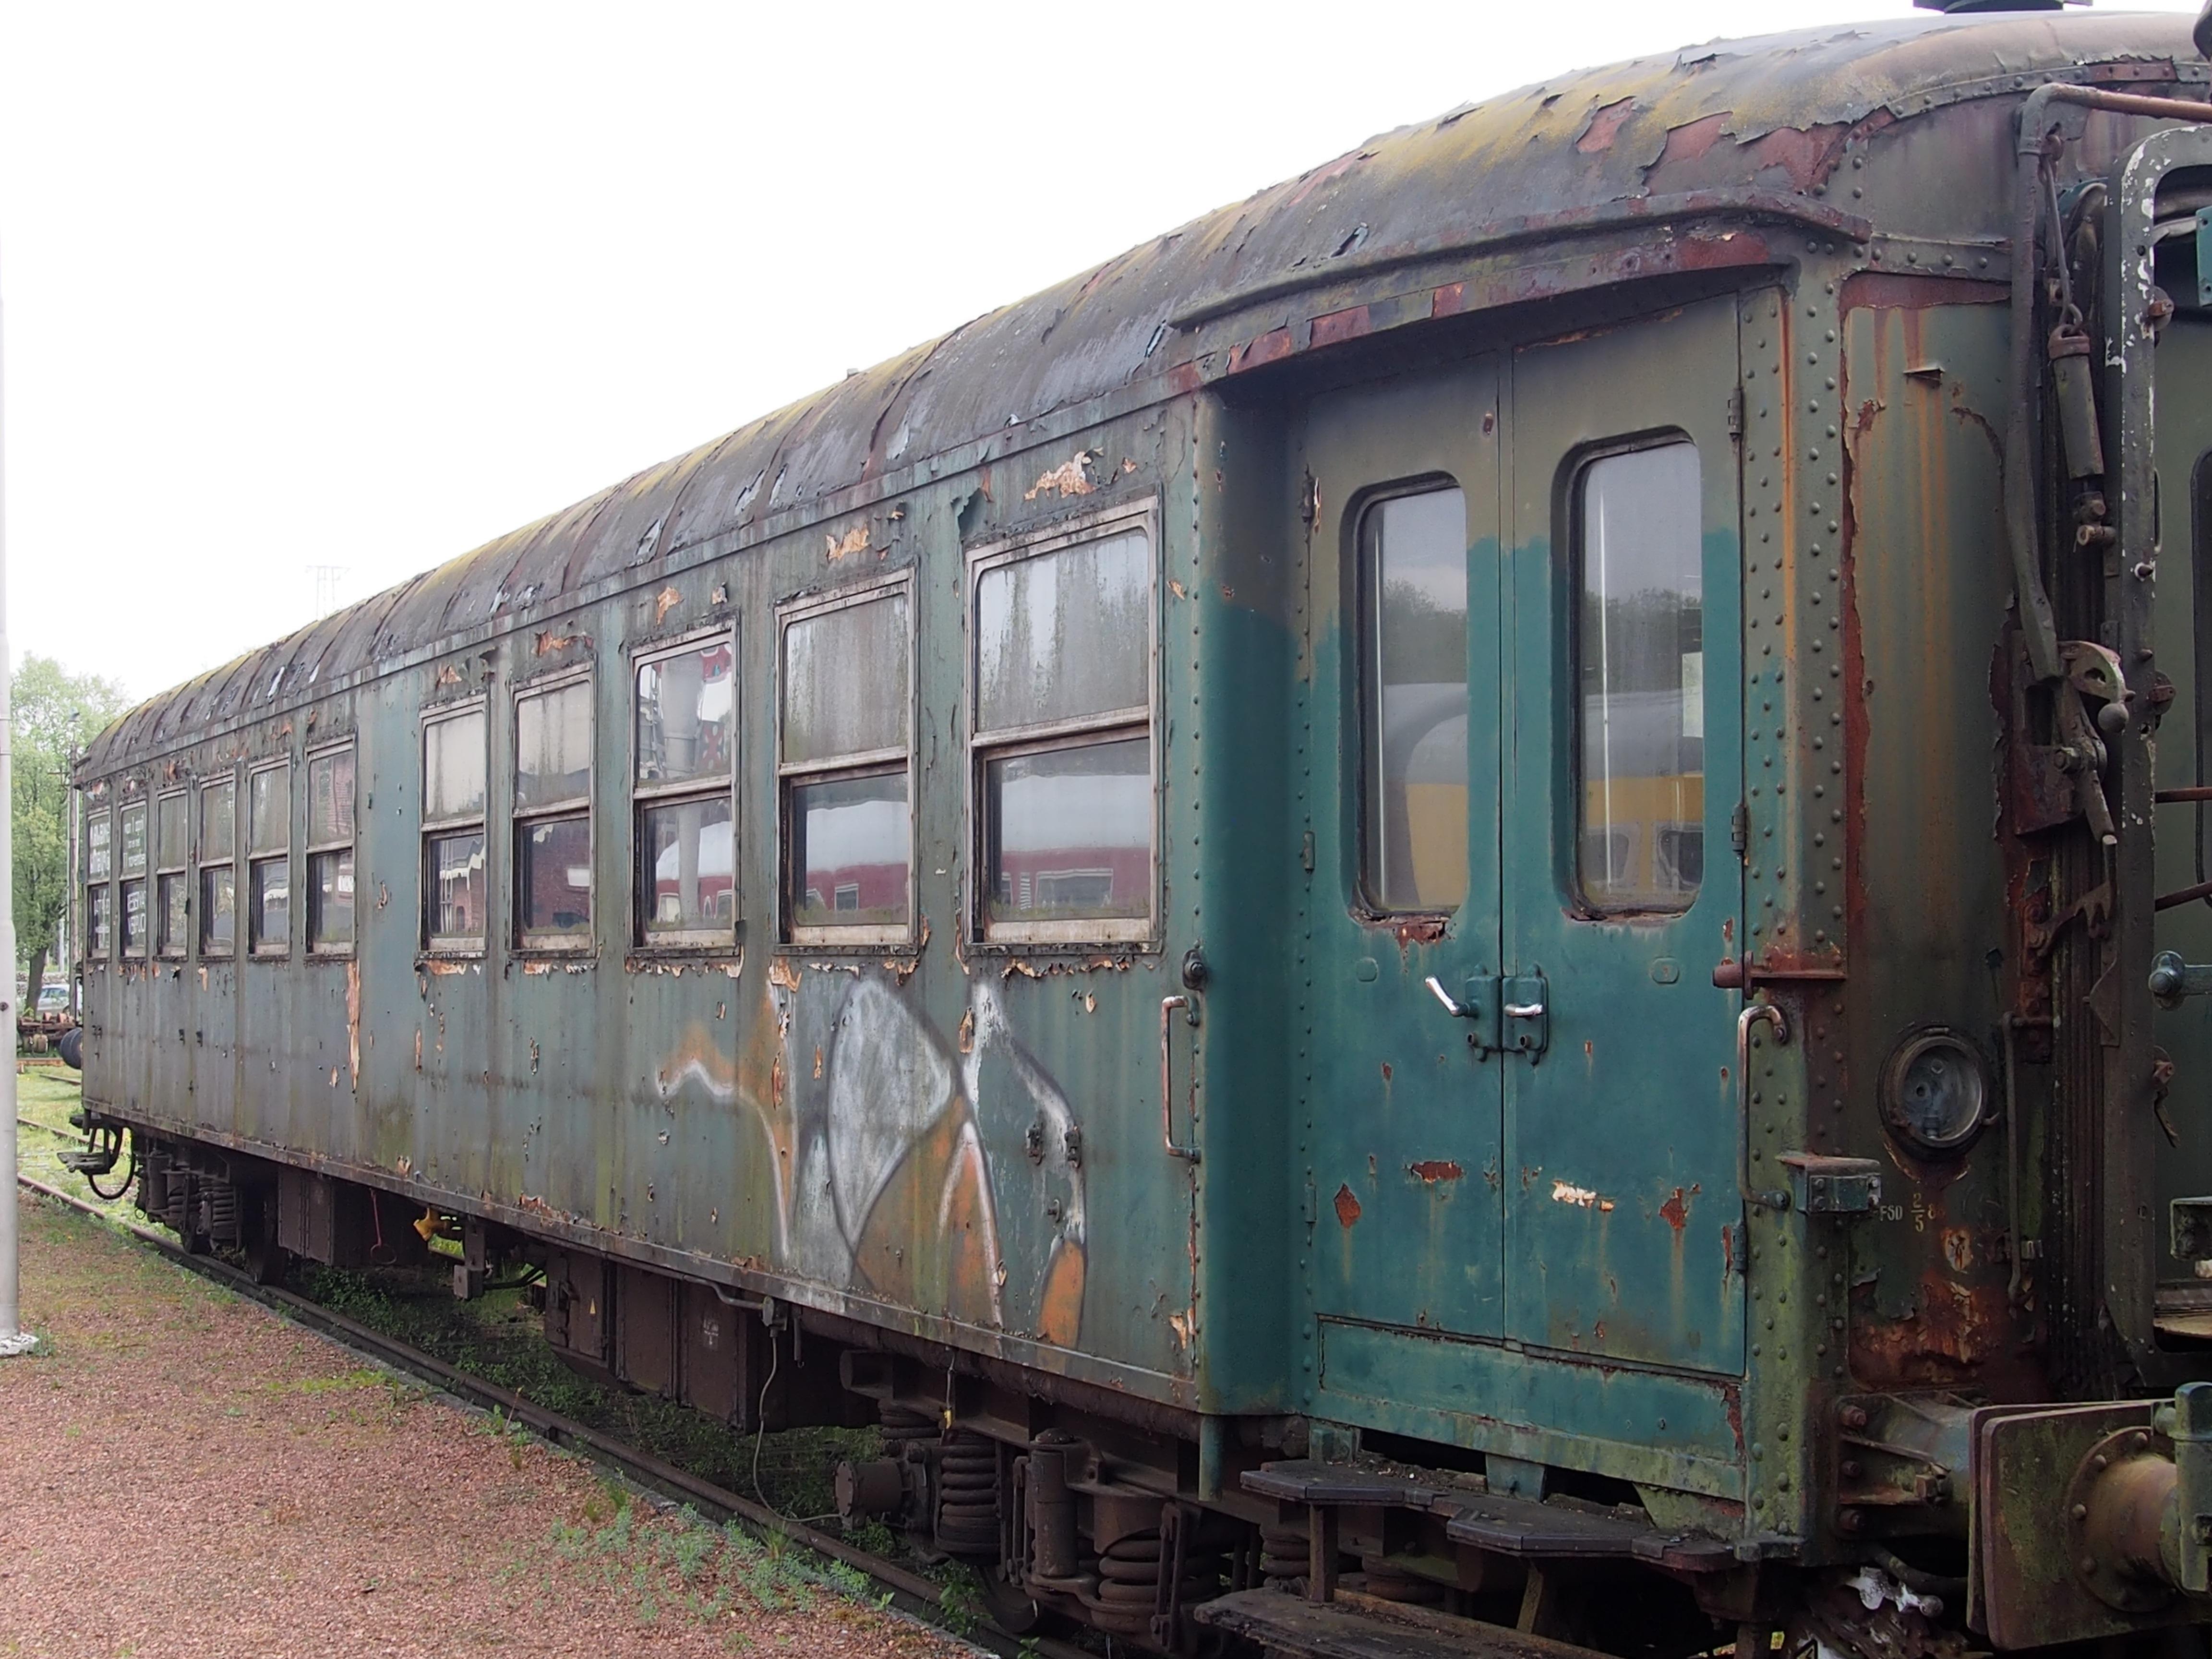 Fotograf Yuk Vagonu Tren Nakliye Trenler Komur Ayrilmak